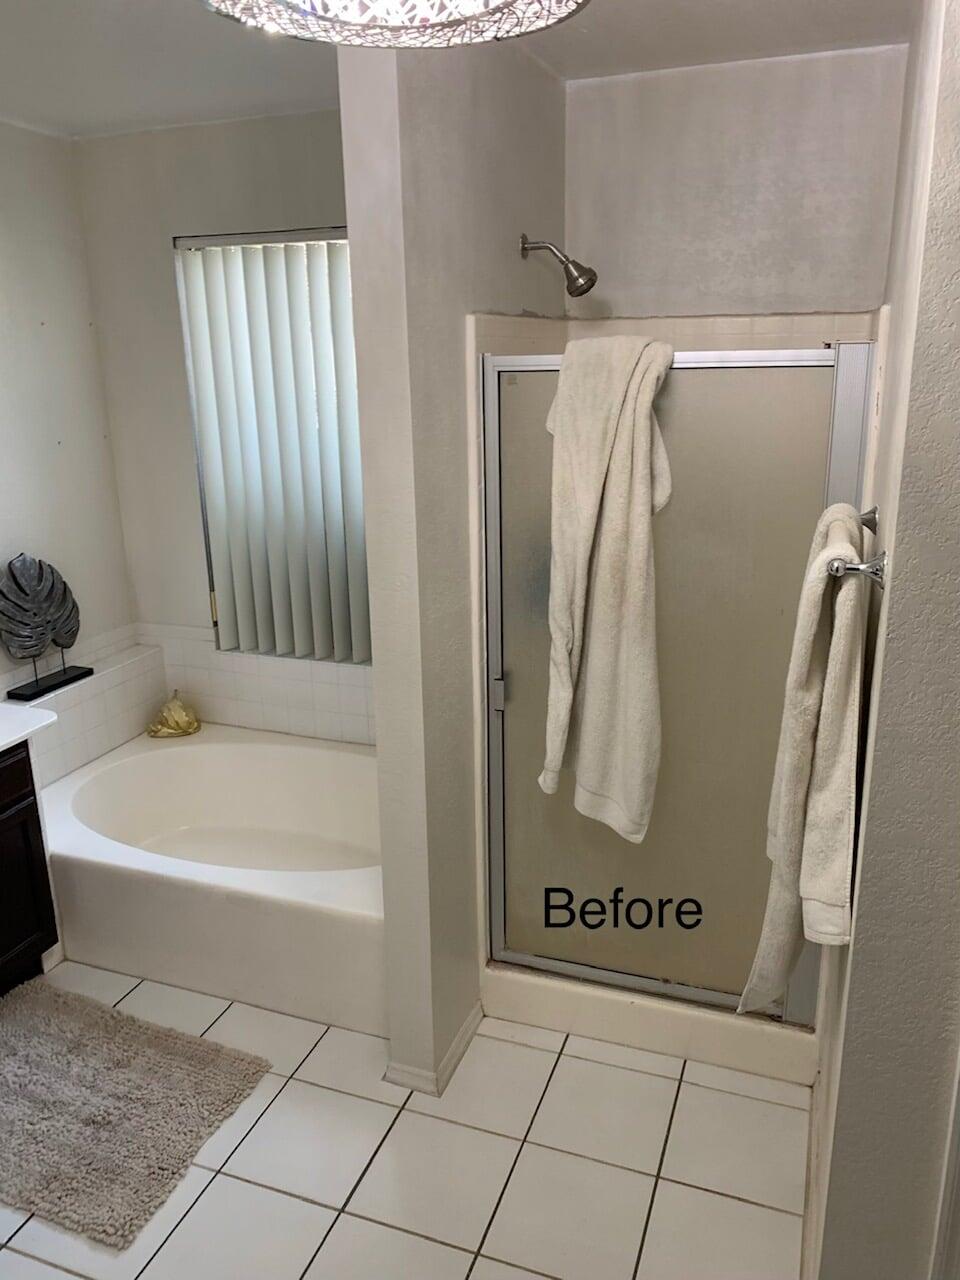 Before a professional bathroom renovation in Glendale, AZ